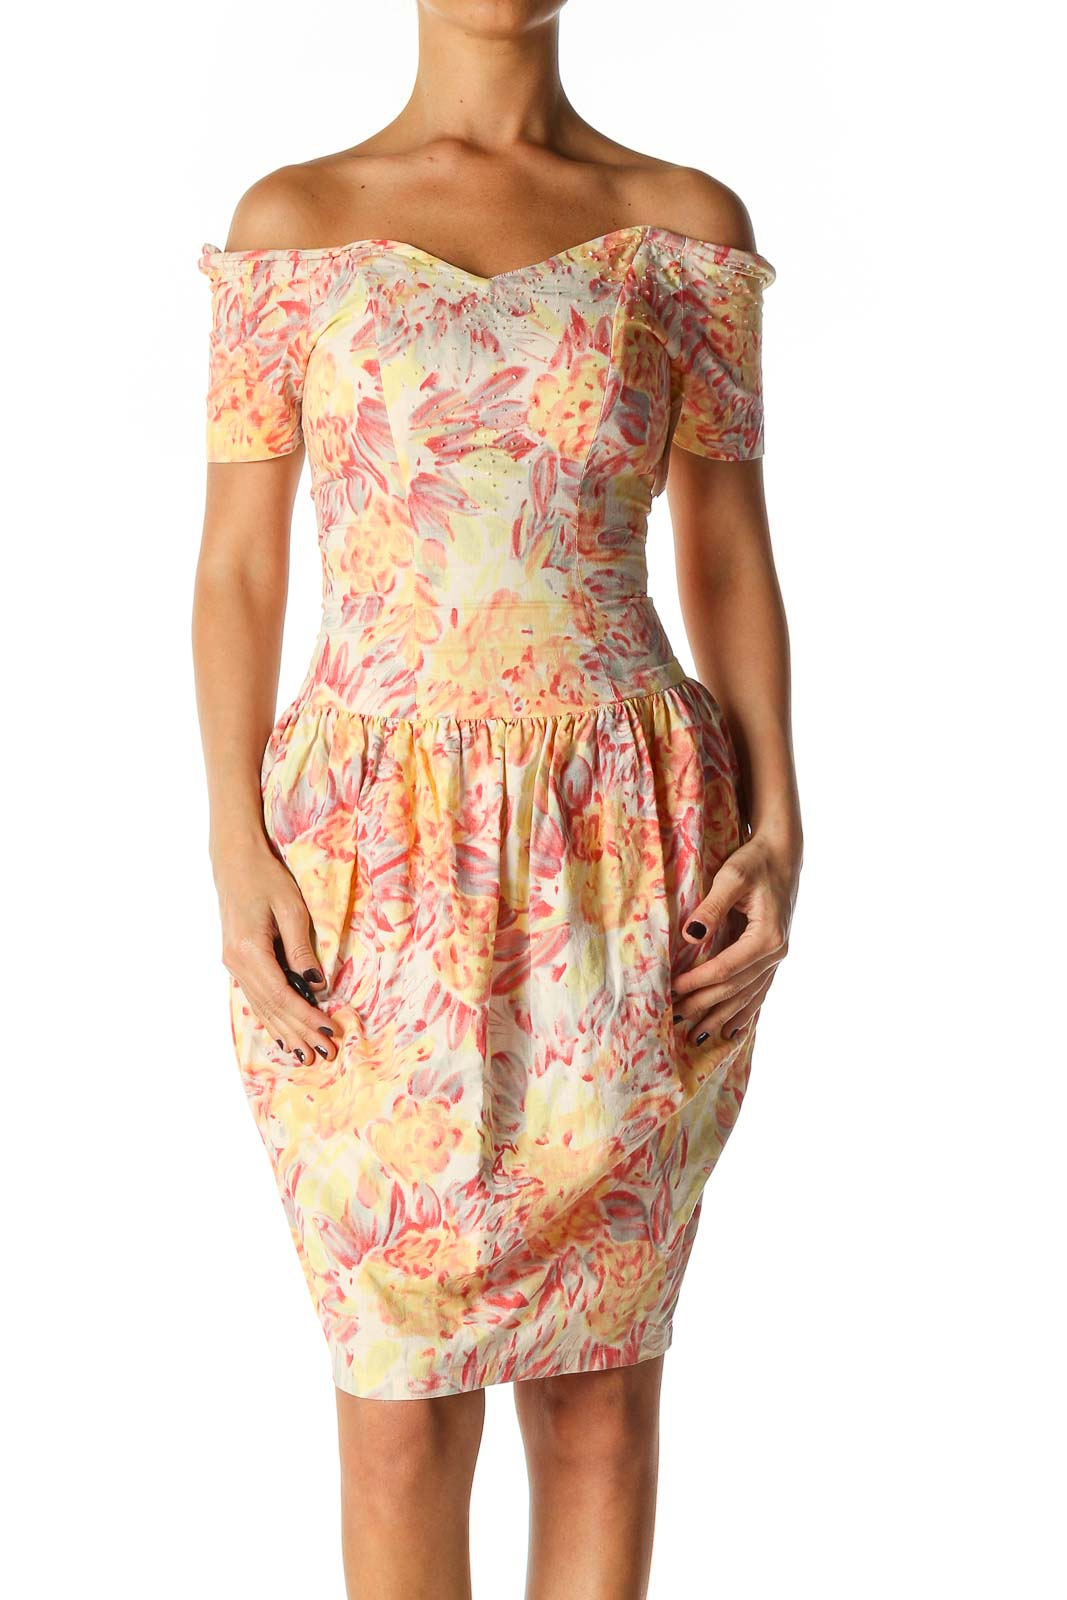 Orange Floral Print Retro Sheath Dress Front